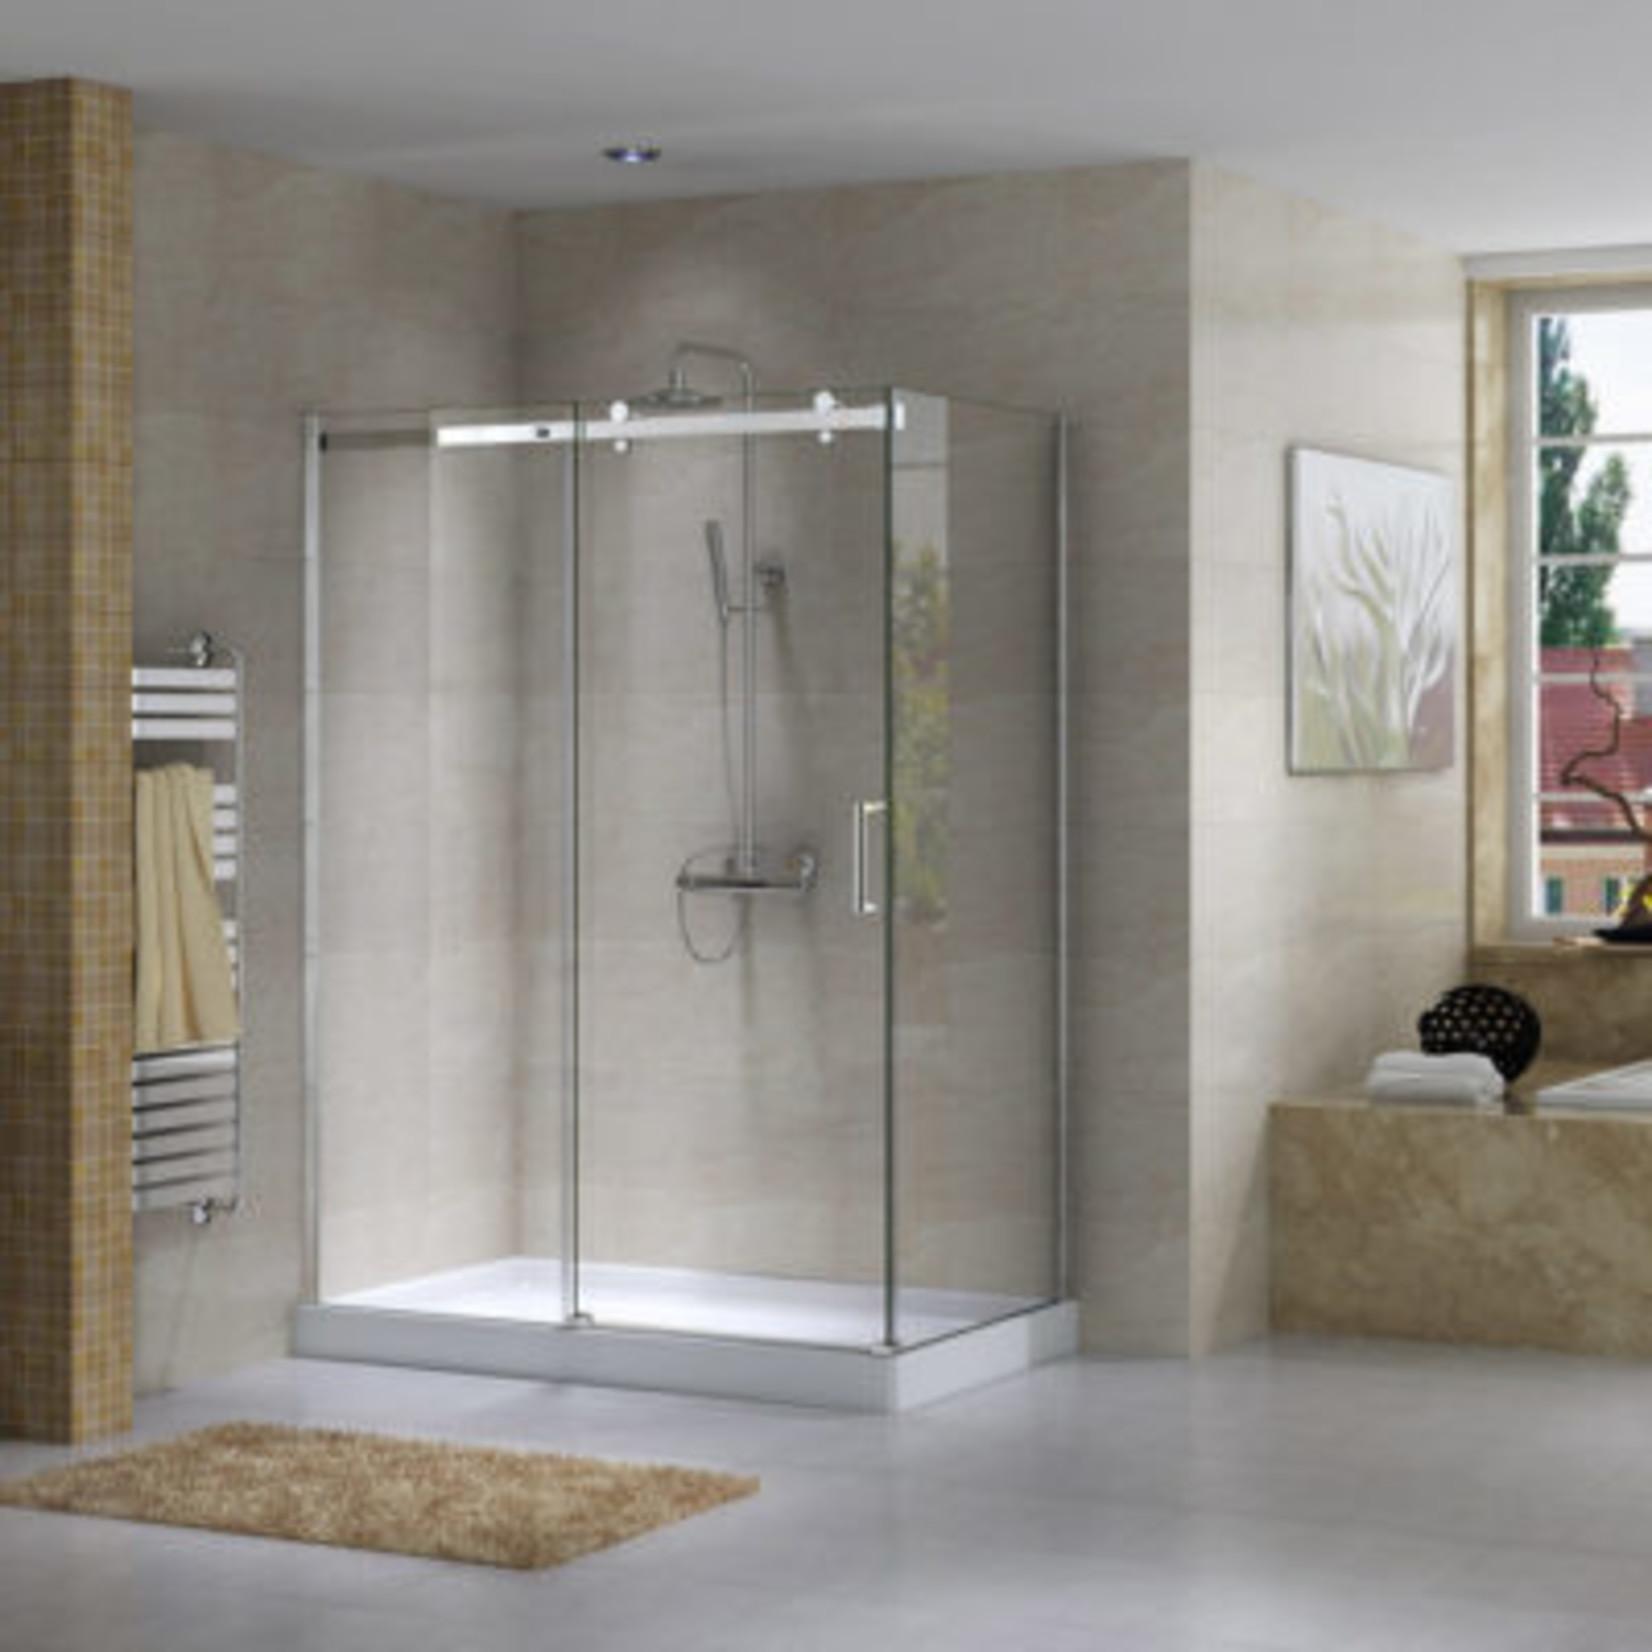 36x48 chrome reversible shower set Quartz Jade series